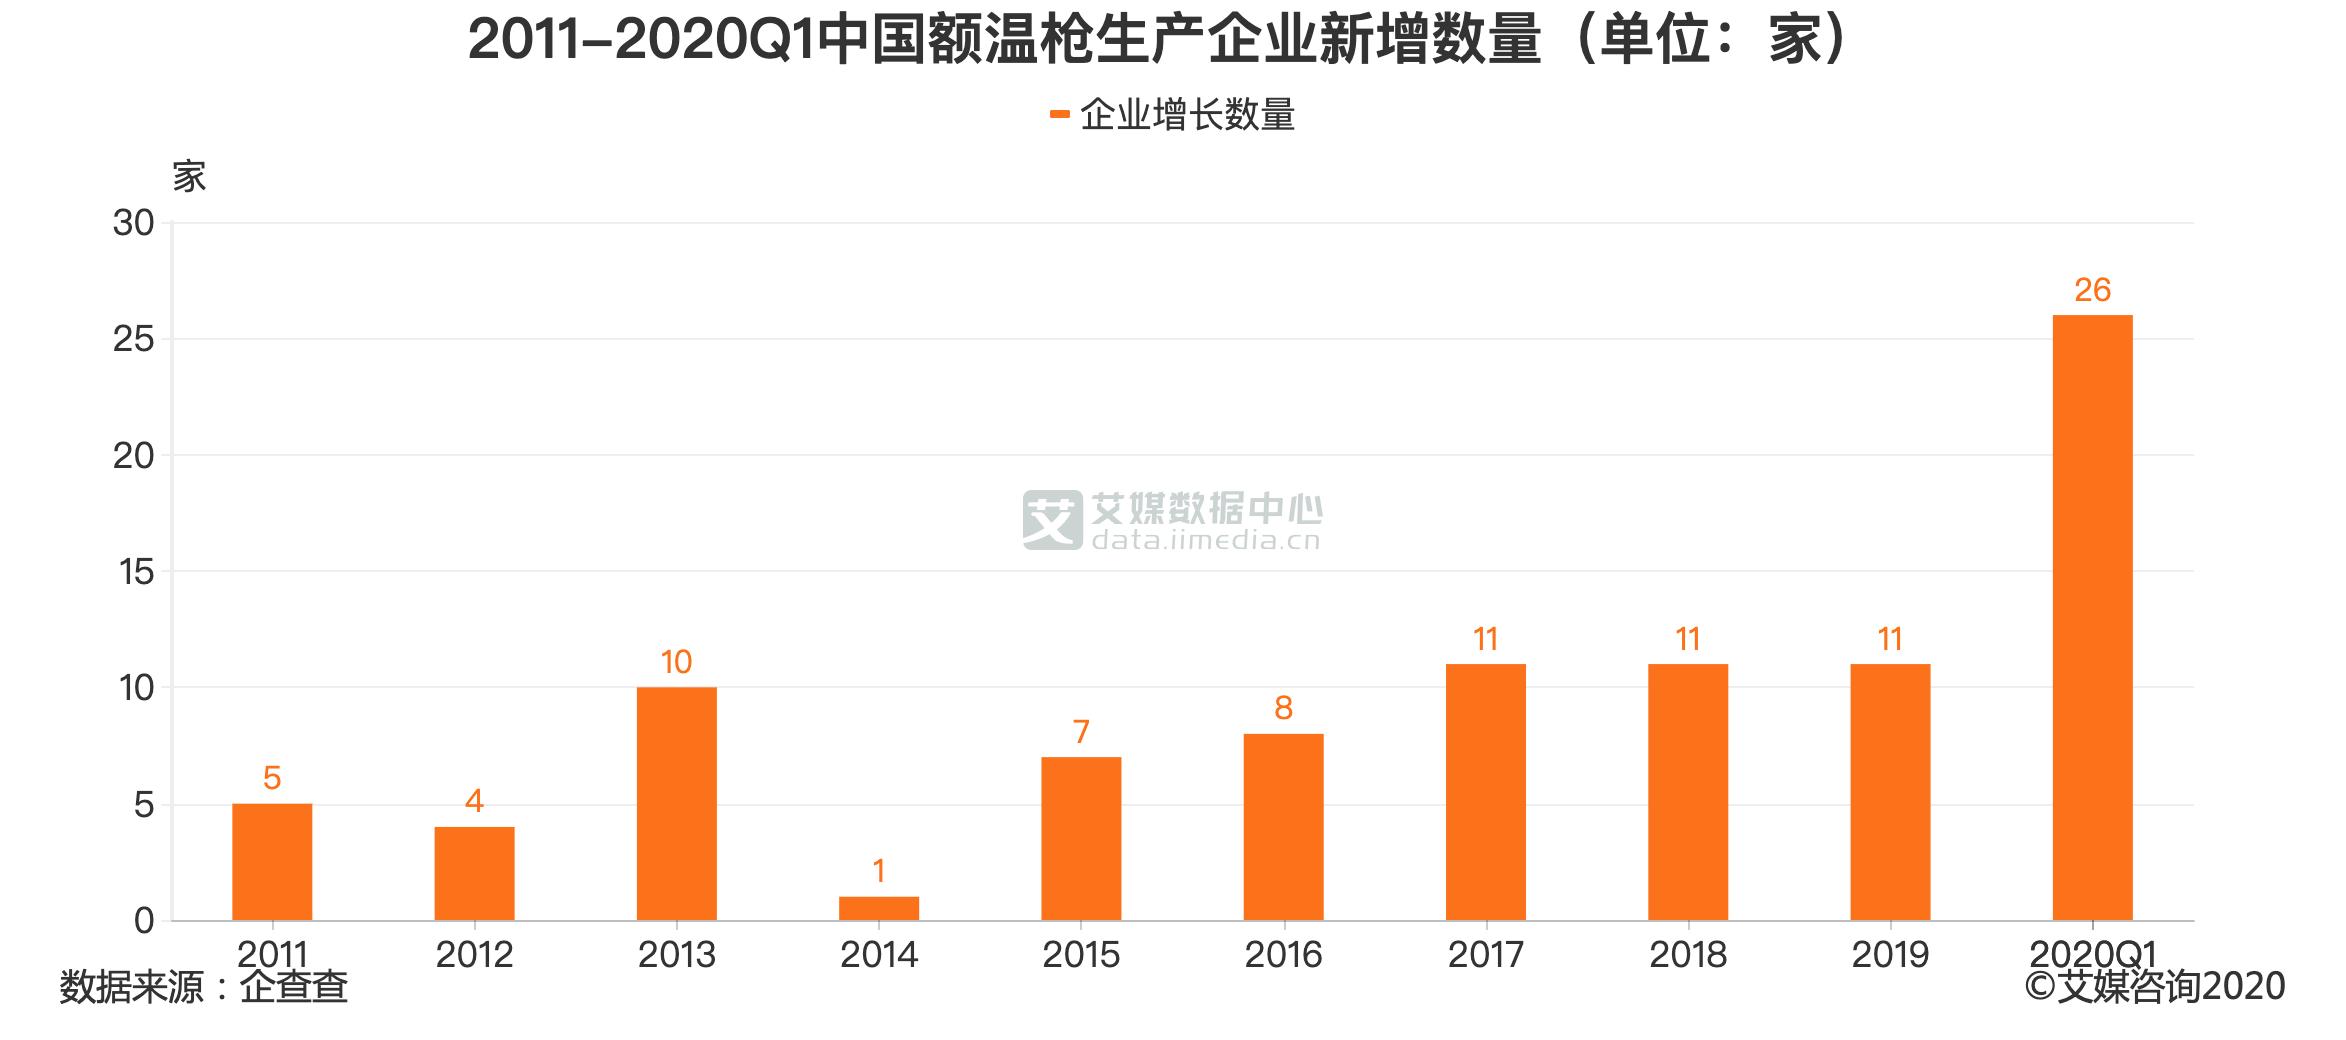 2011-2020Q1中国额温枪生产企业新增数量(单位:家)